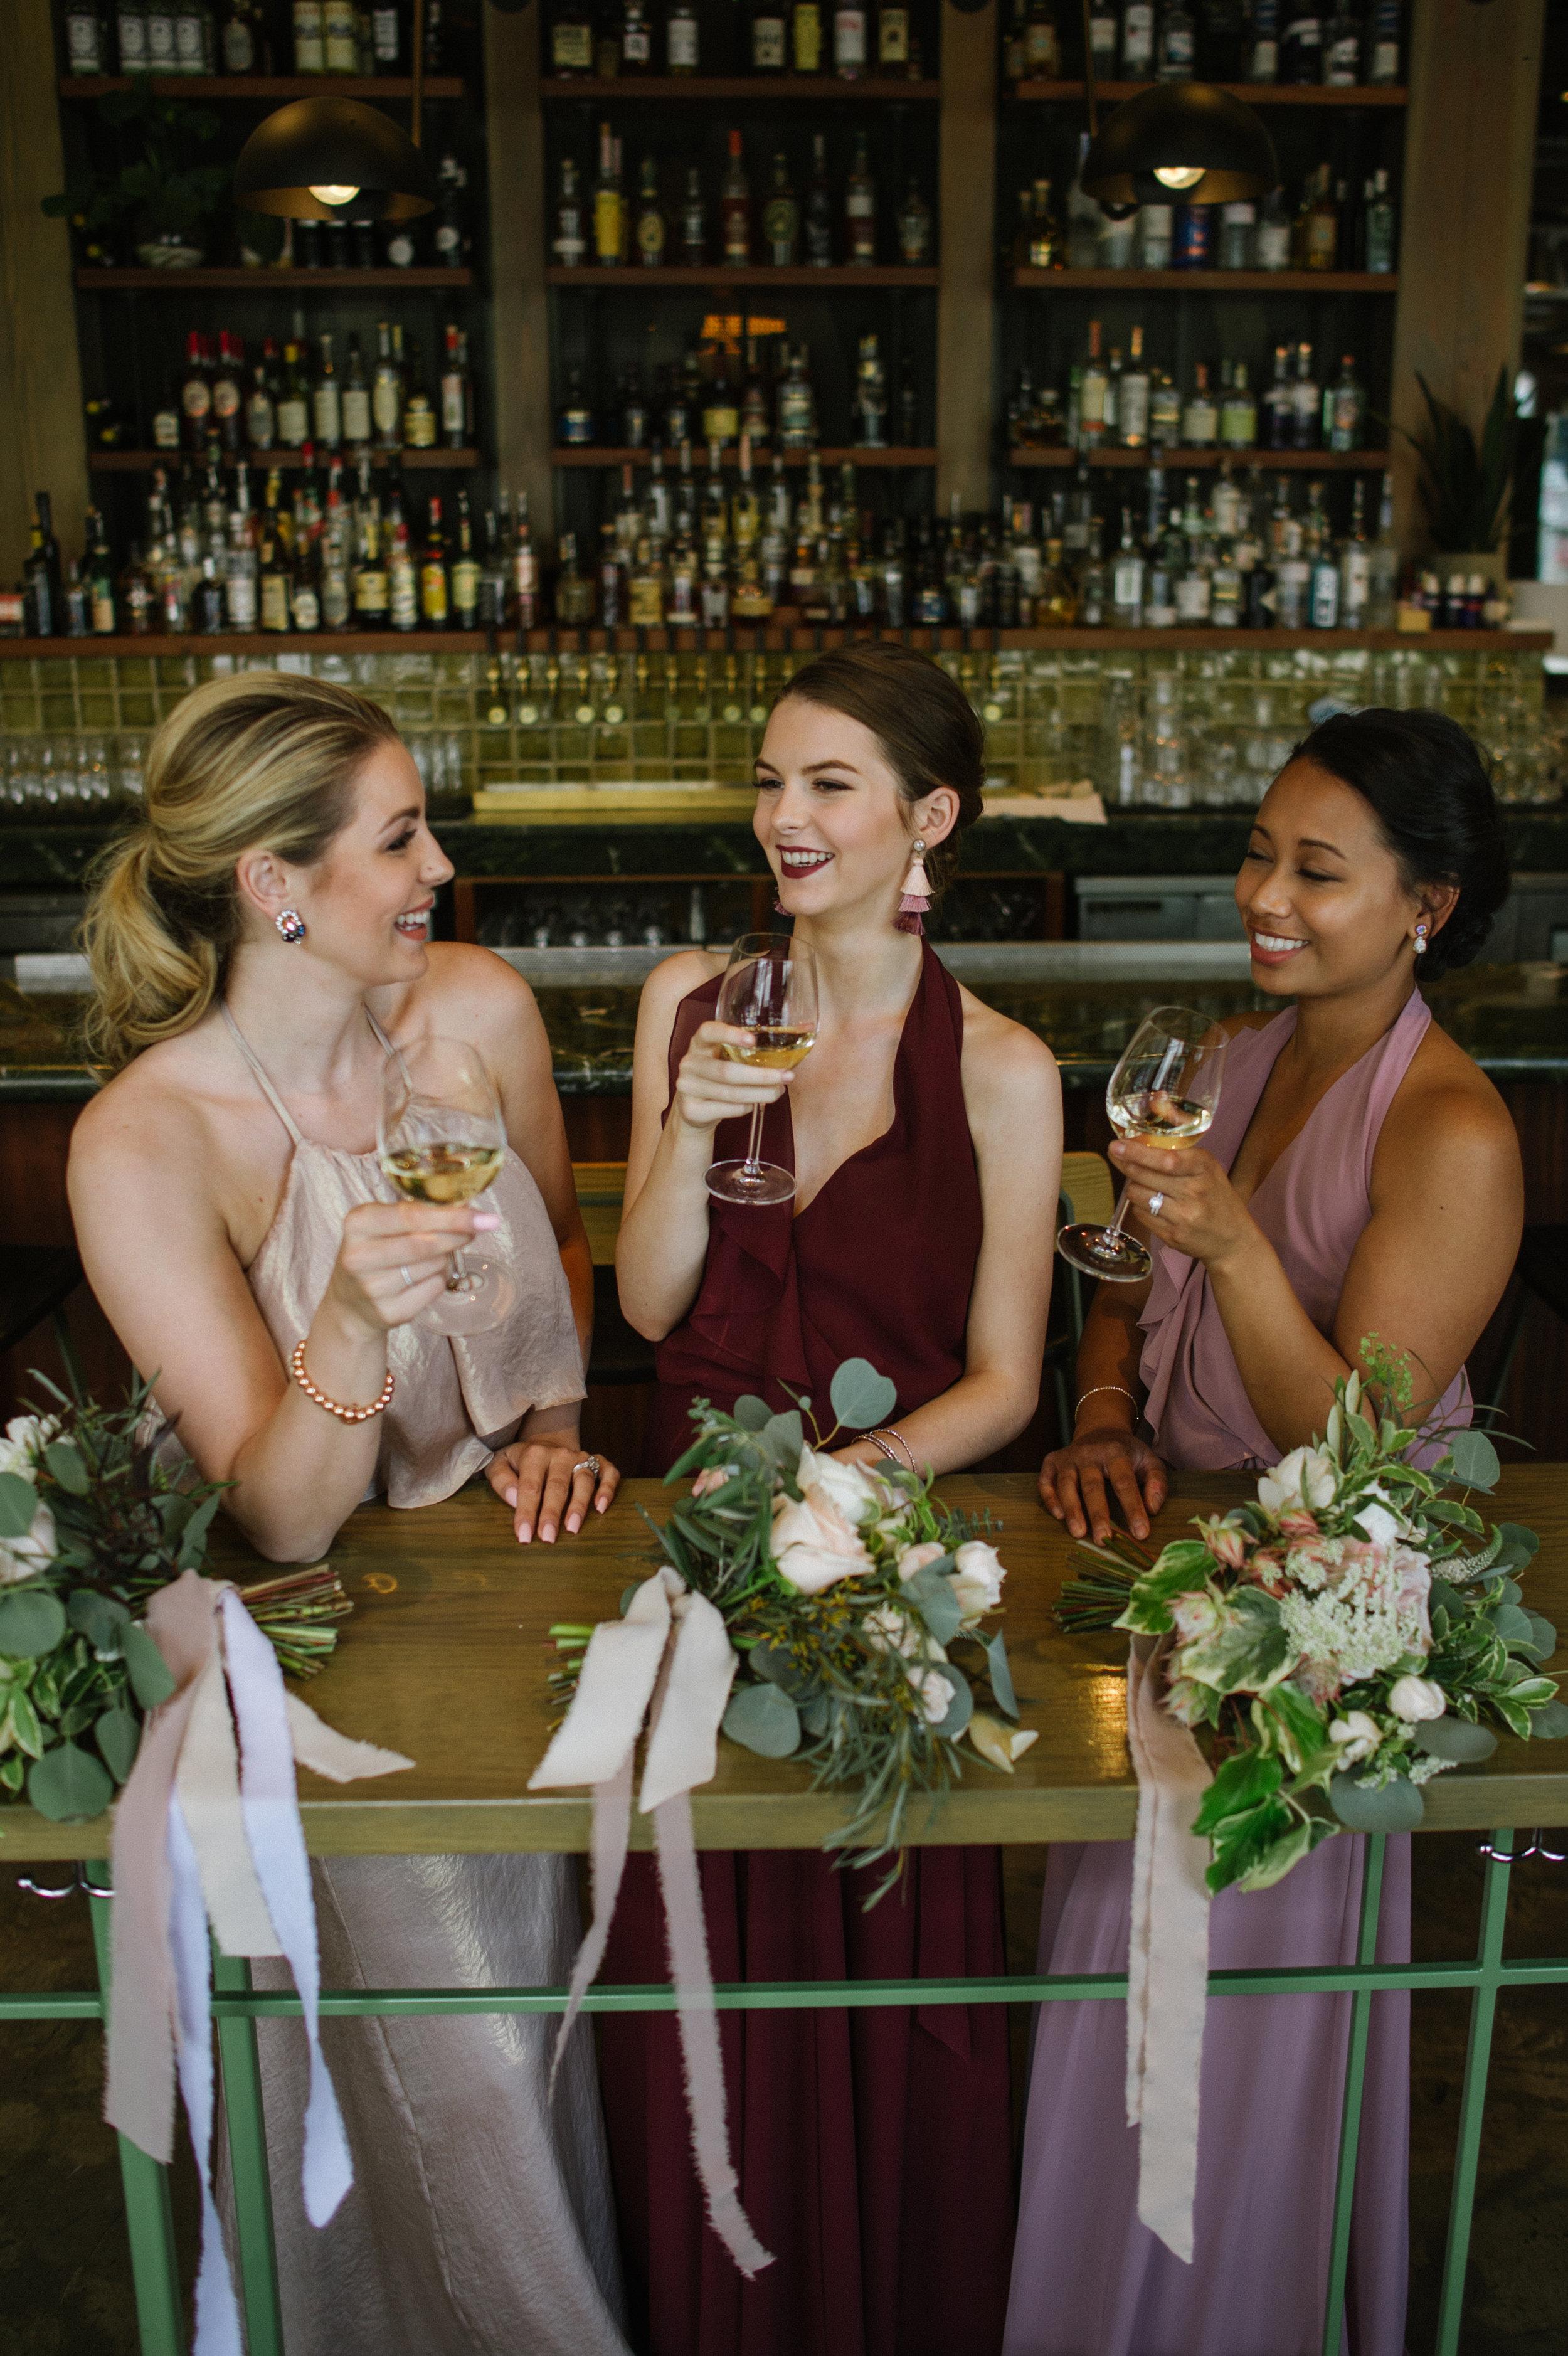 Calgary_Wedding_Photography_Bridgette_Bar_Bridesmaids_Shoot_2018_HR058.jpg